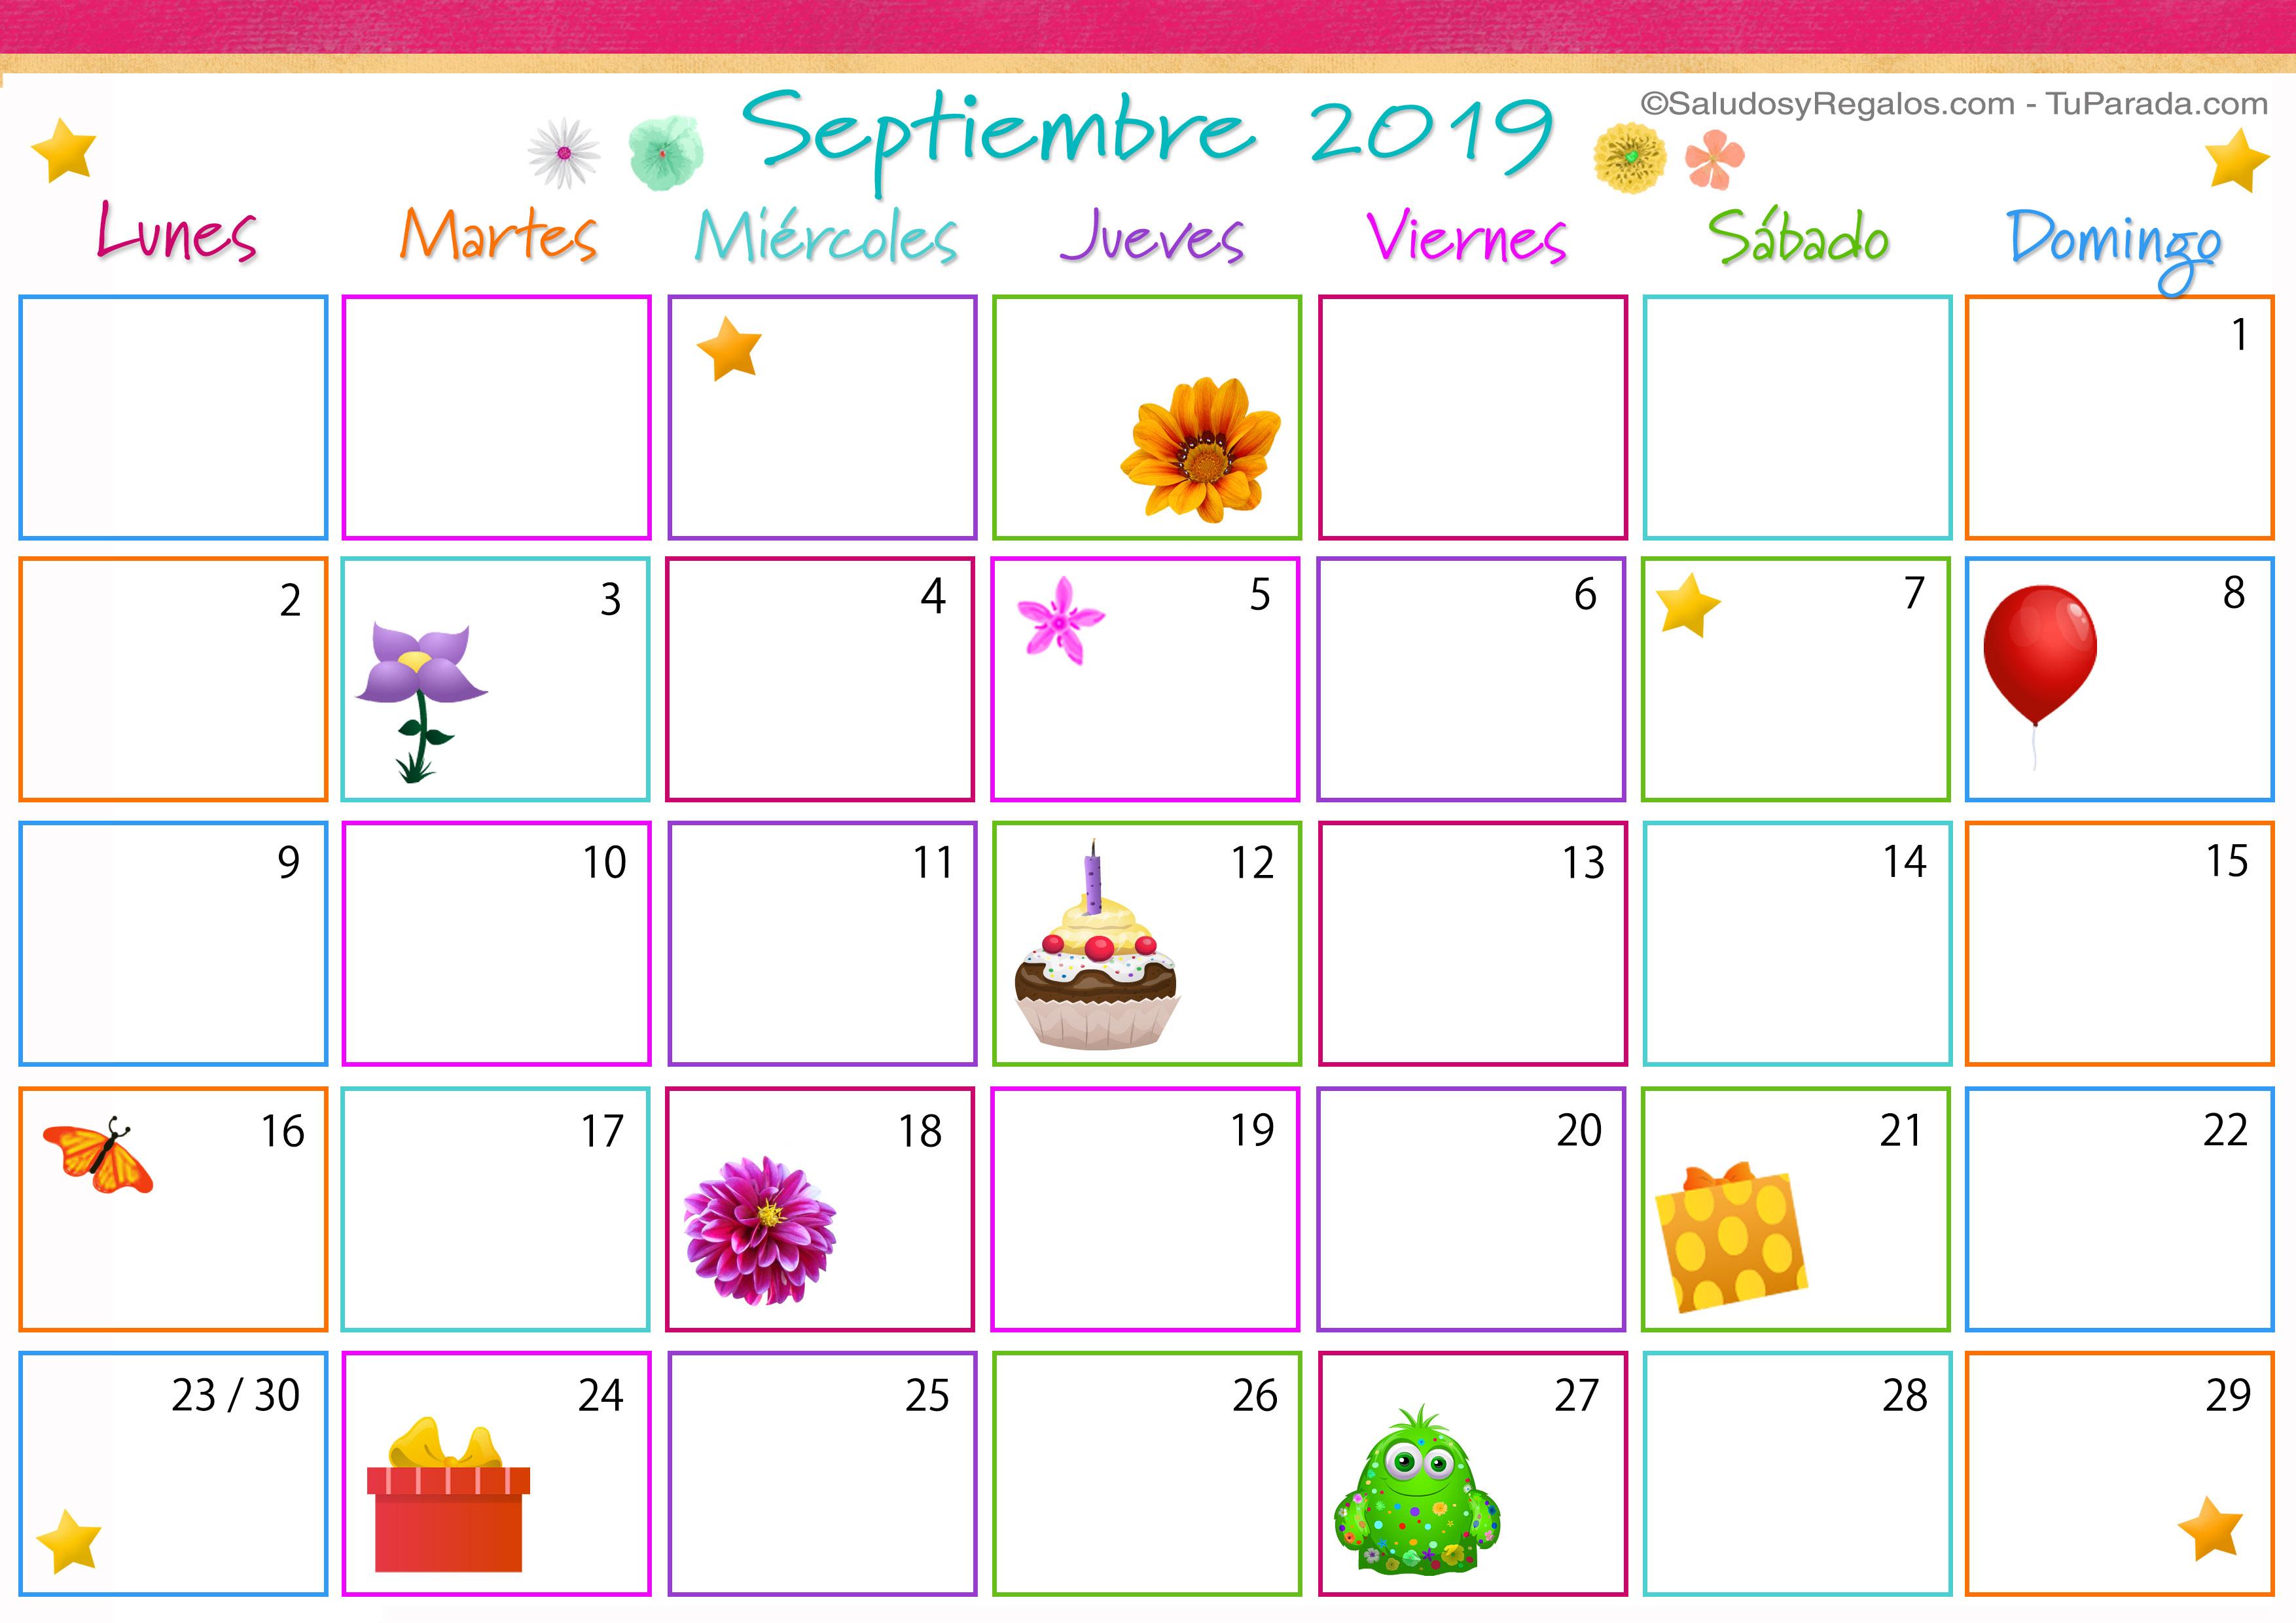 Calendario De Septiembre.Calendario Multicolor Septiembre 2019 Calendario Multicolor 2019